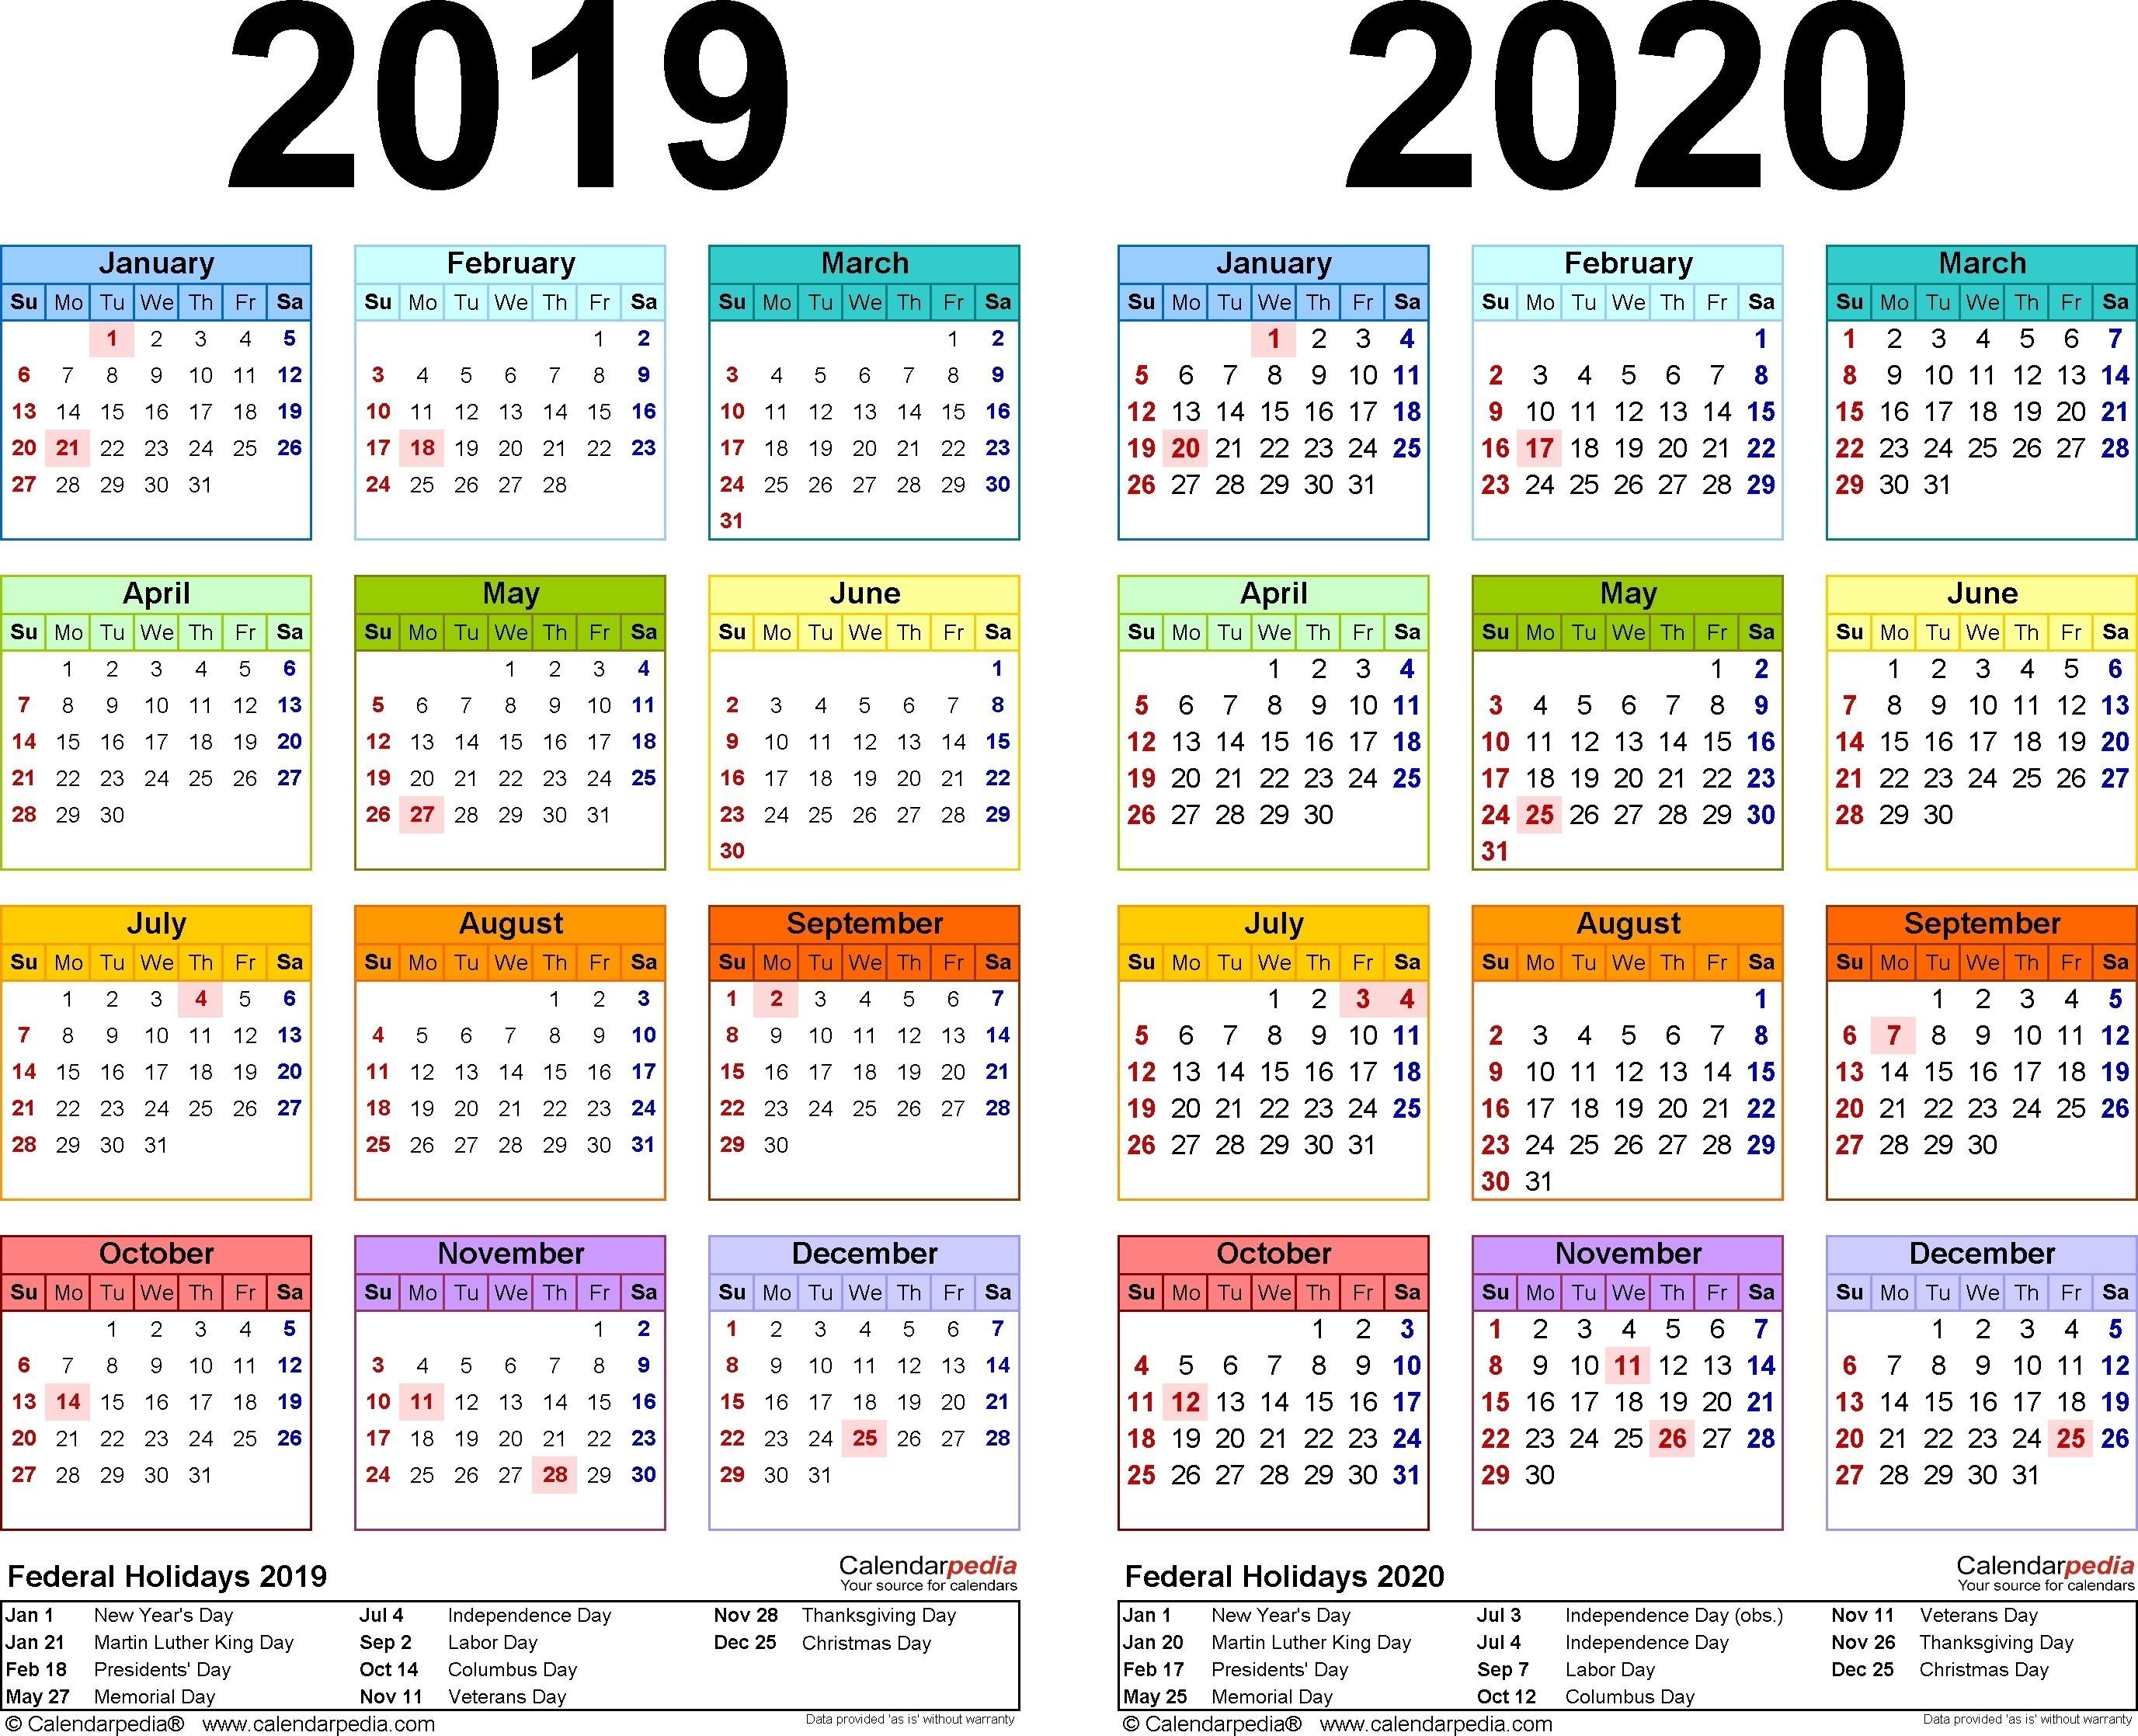 Calendar Holiday 2019 Philippines Election Senator - Calendaro-Philippine Holidays 2020 Calendar